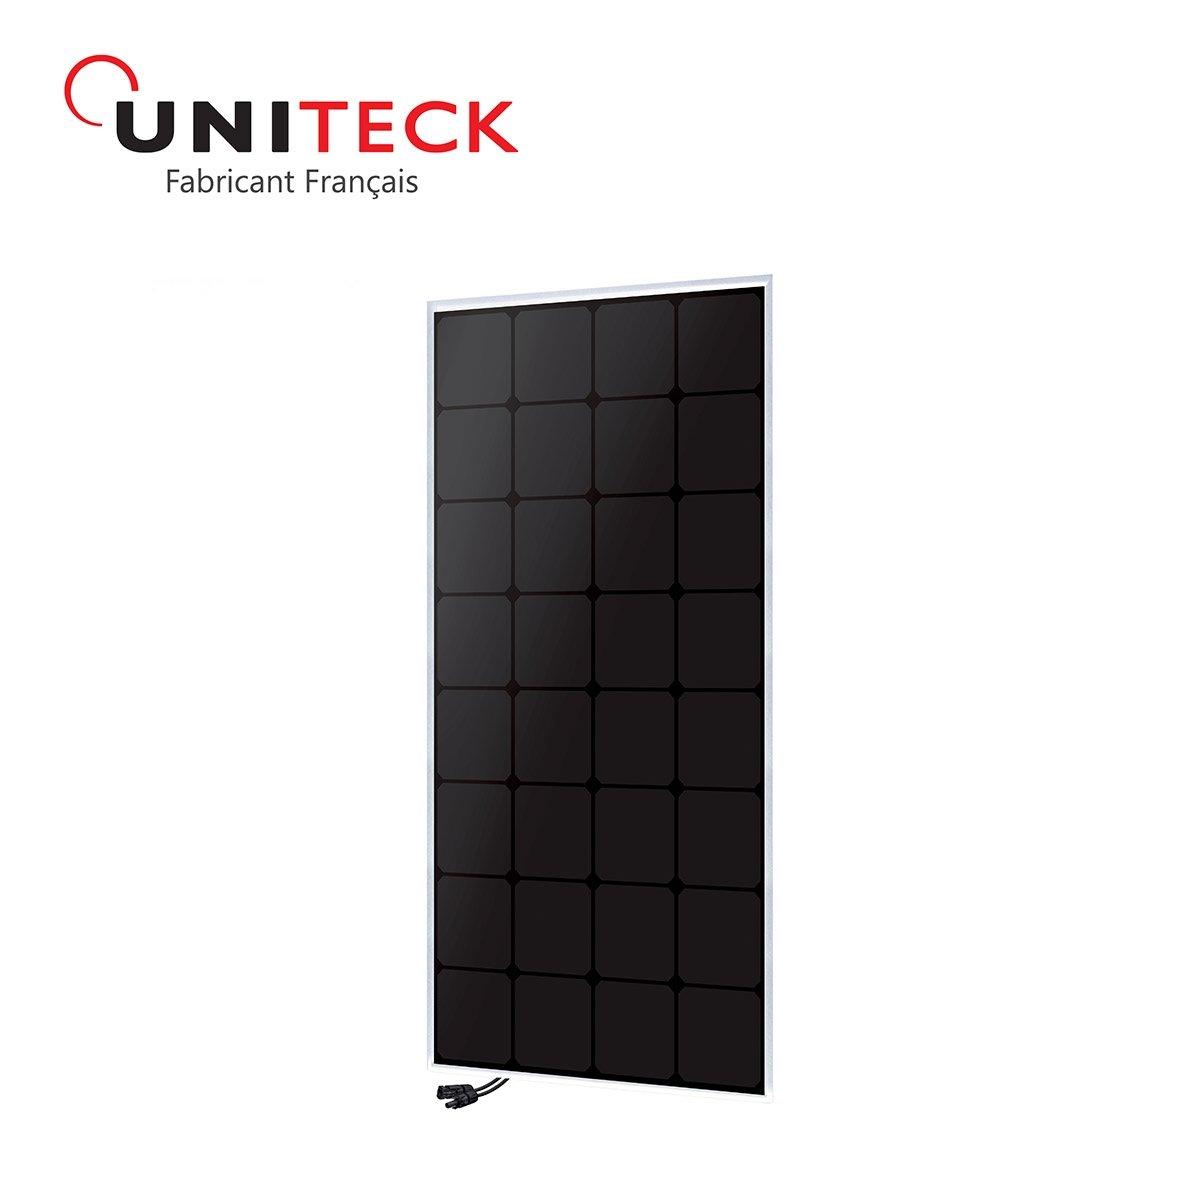 Solarpanel unisun 100W back-contact 12V